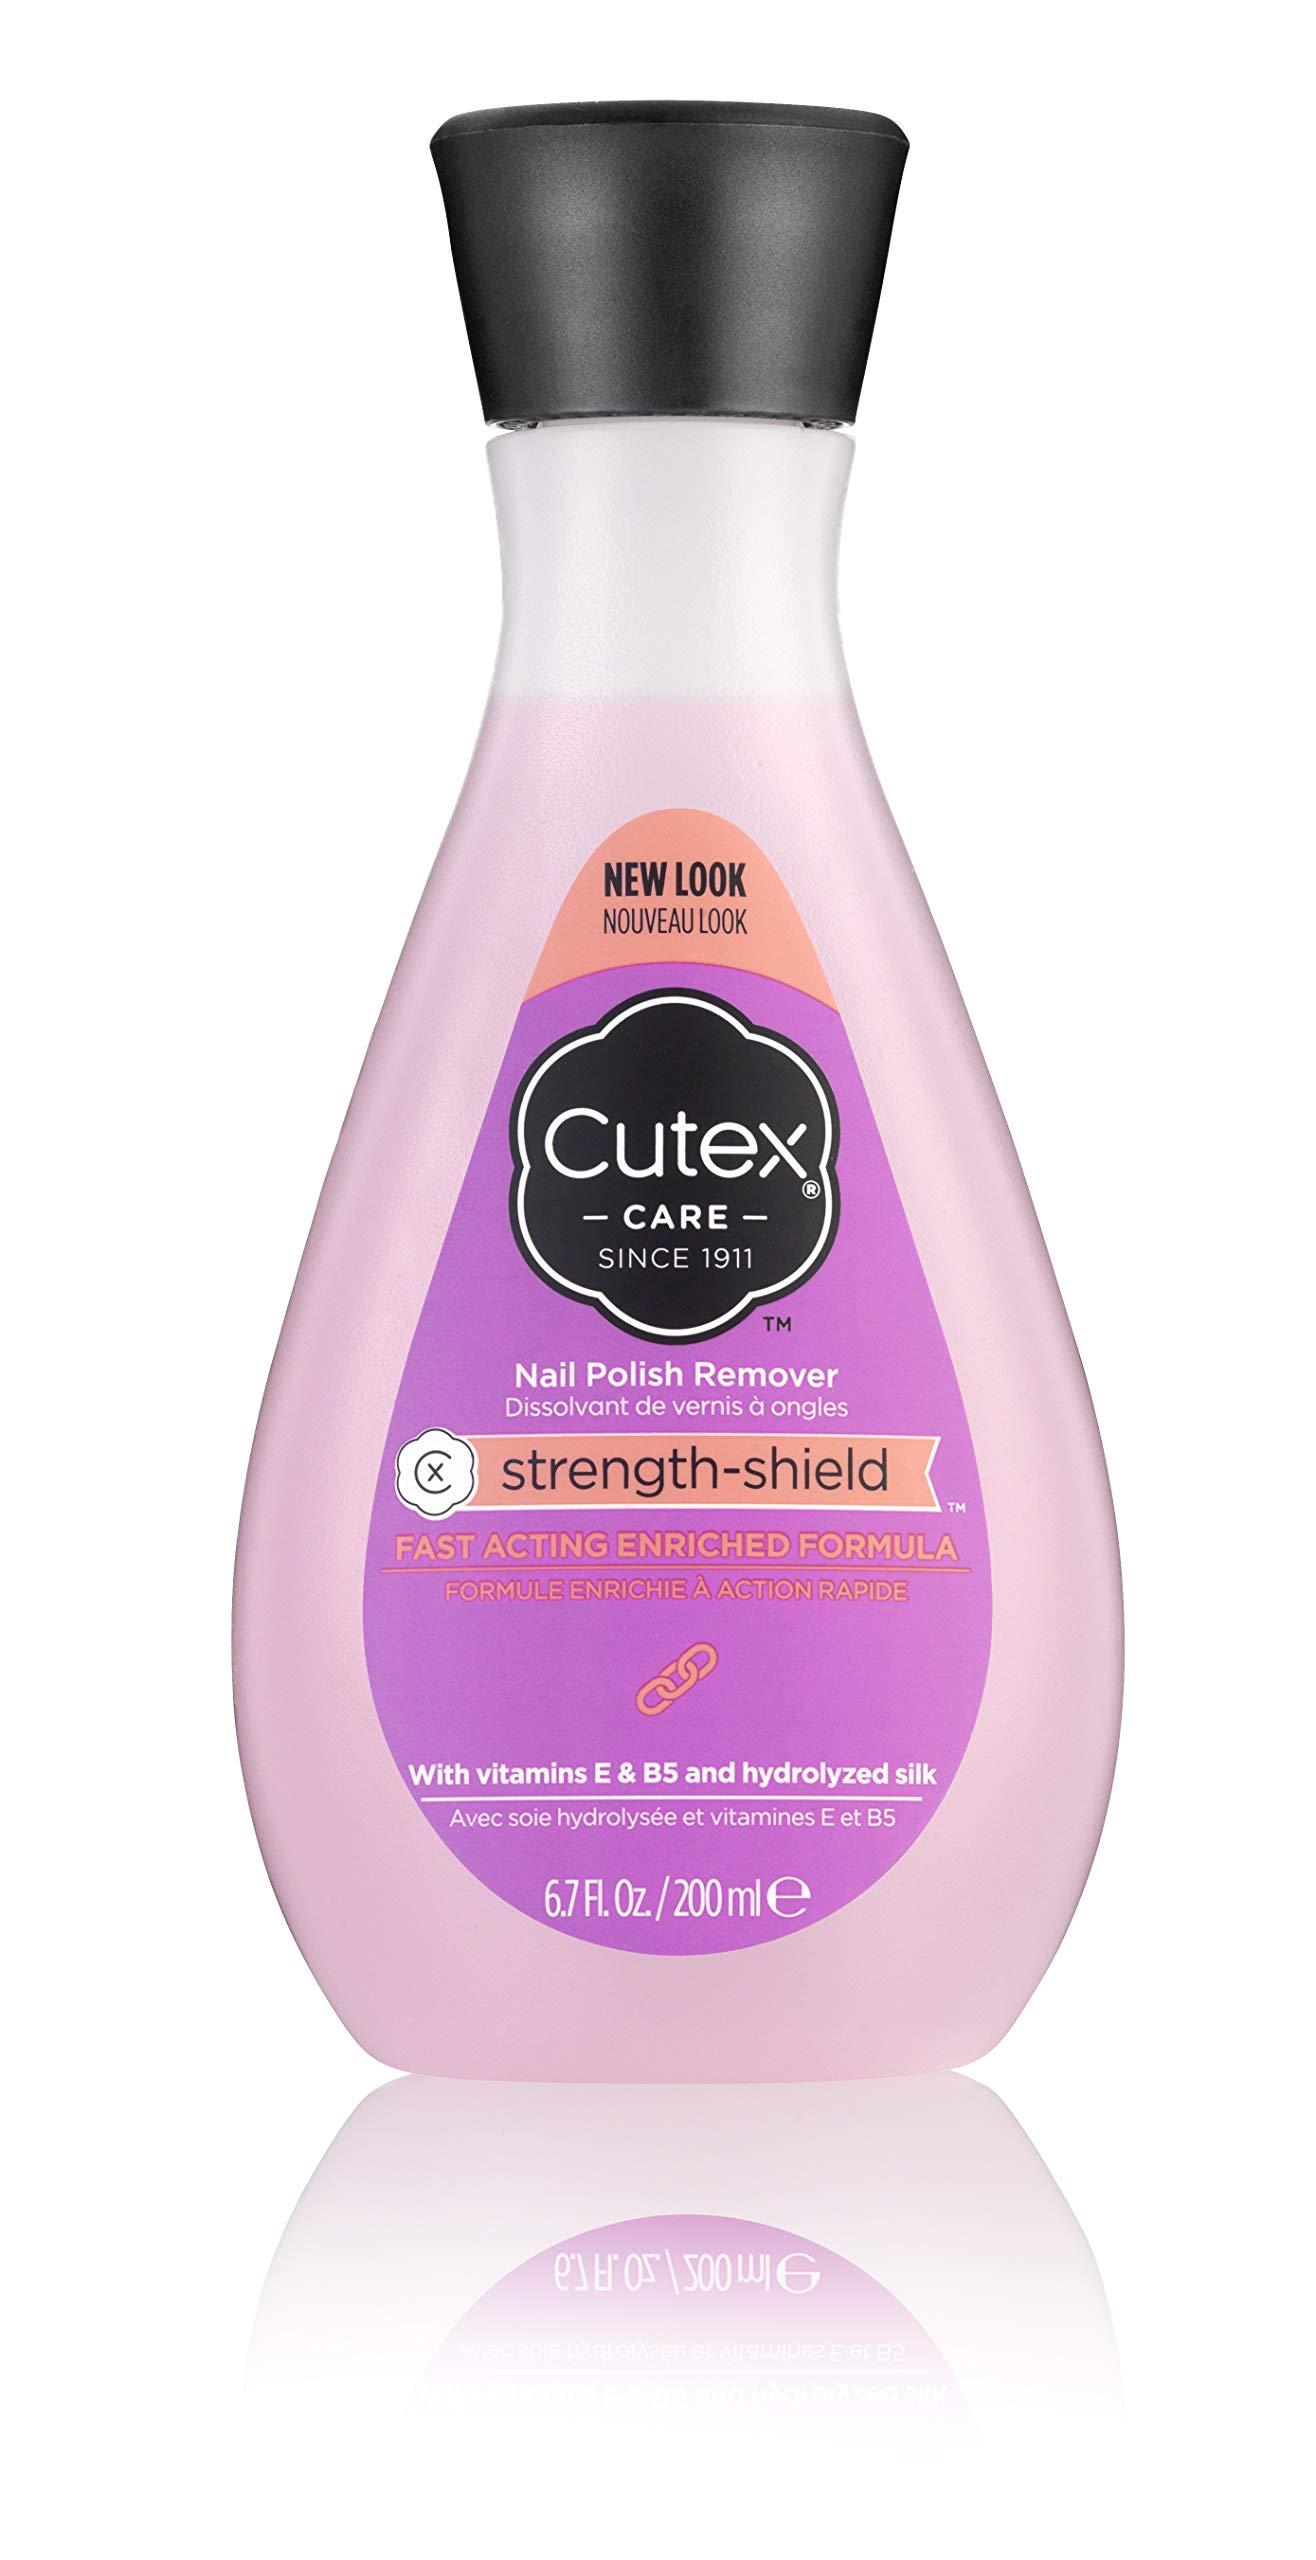 Cutex strength shield Nail Polish Remover 6.76 Fl Oz by Cutex